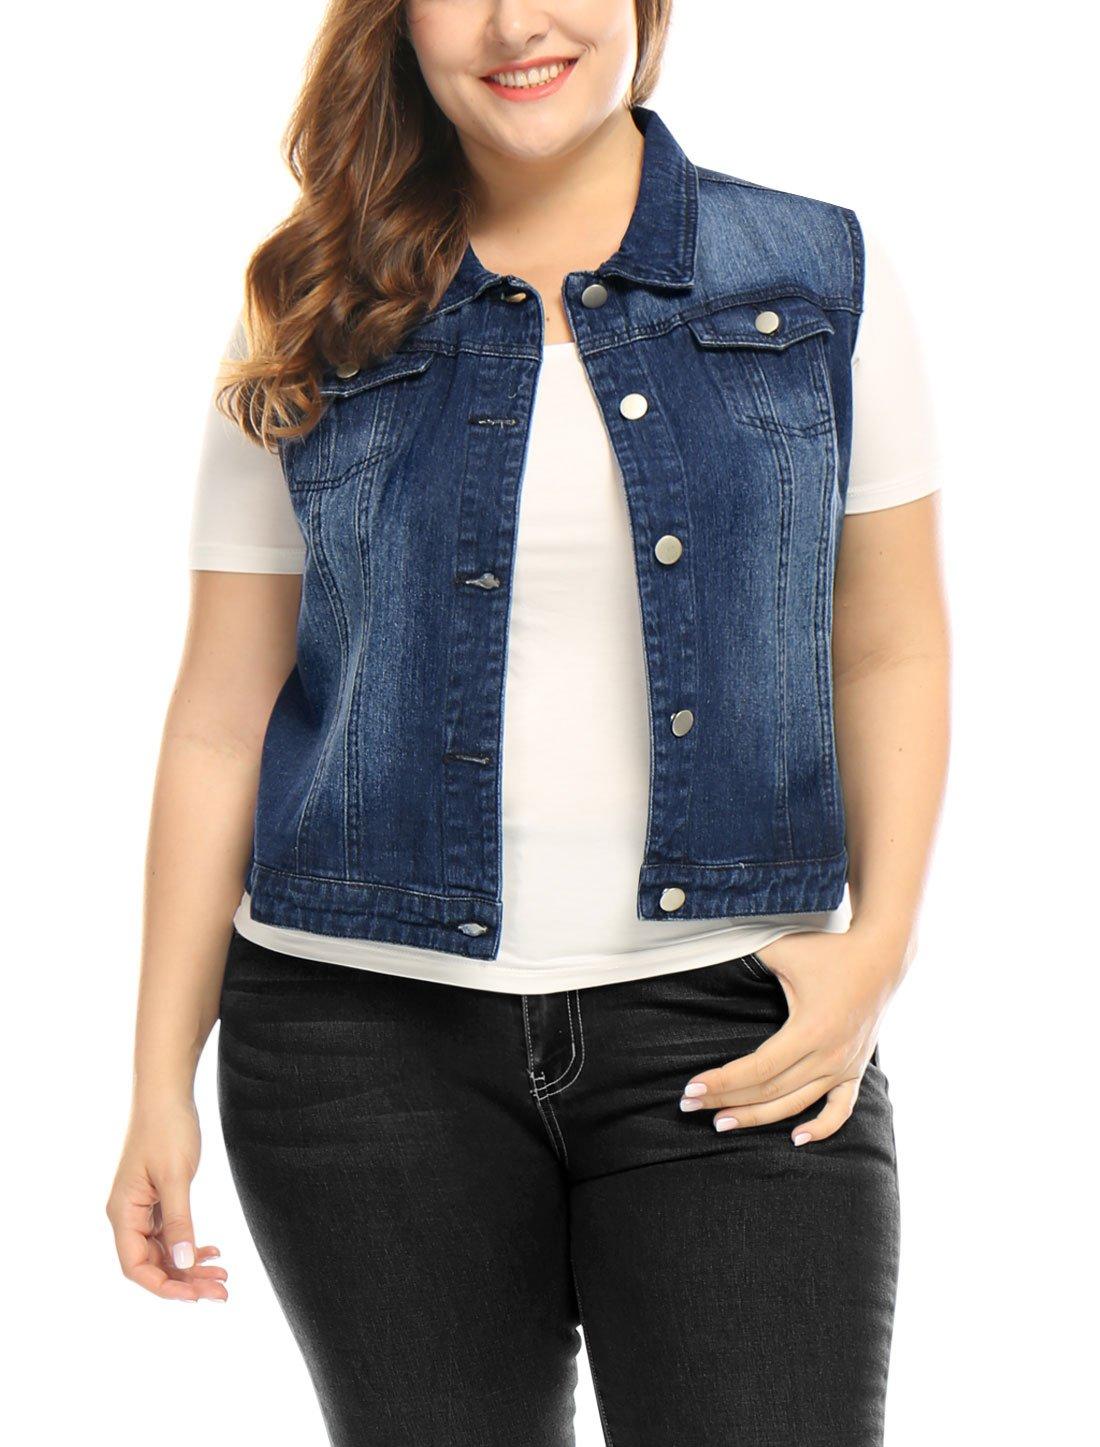 uxcell Women Plus Size Slim Fit Denim Vest Blue 1X by uxcell (Image #1)